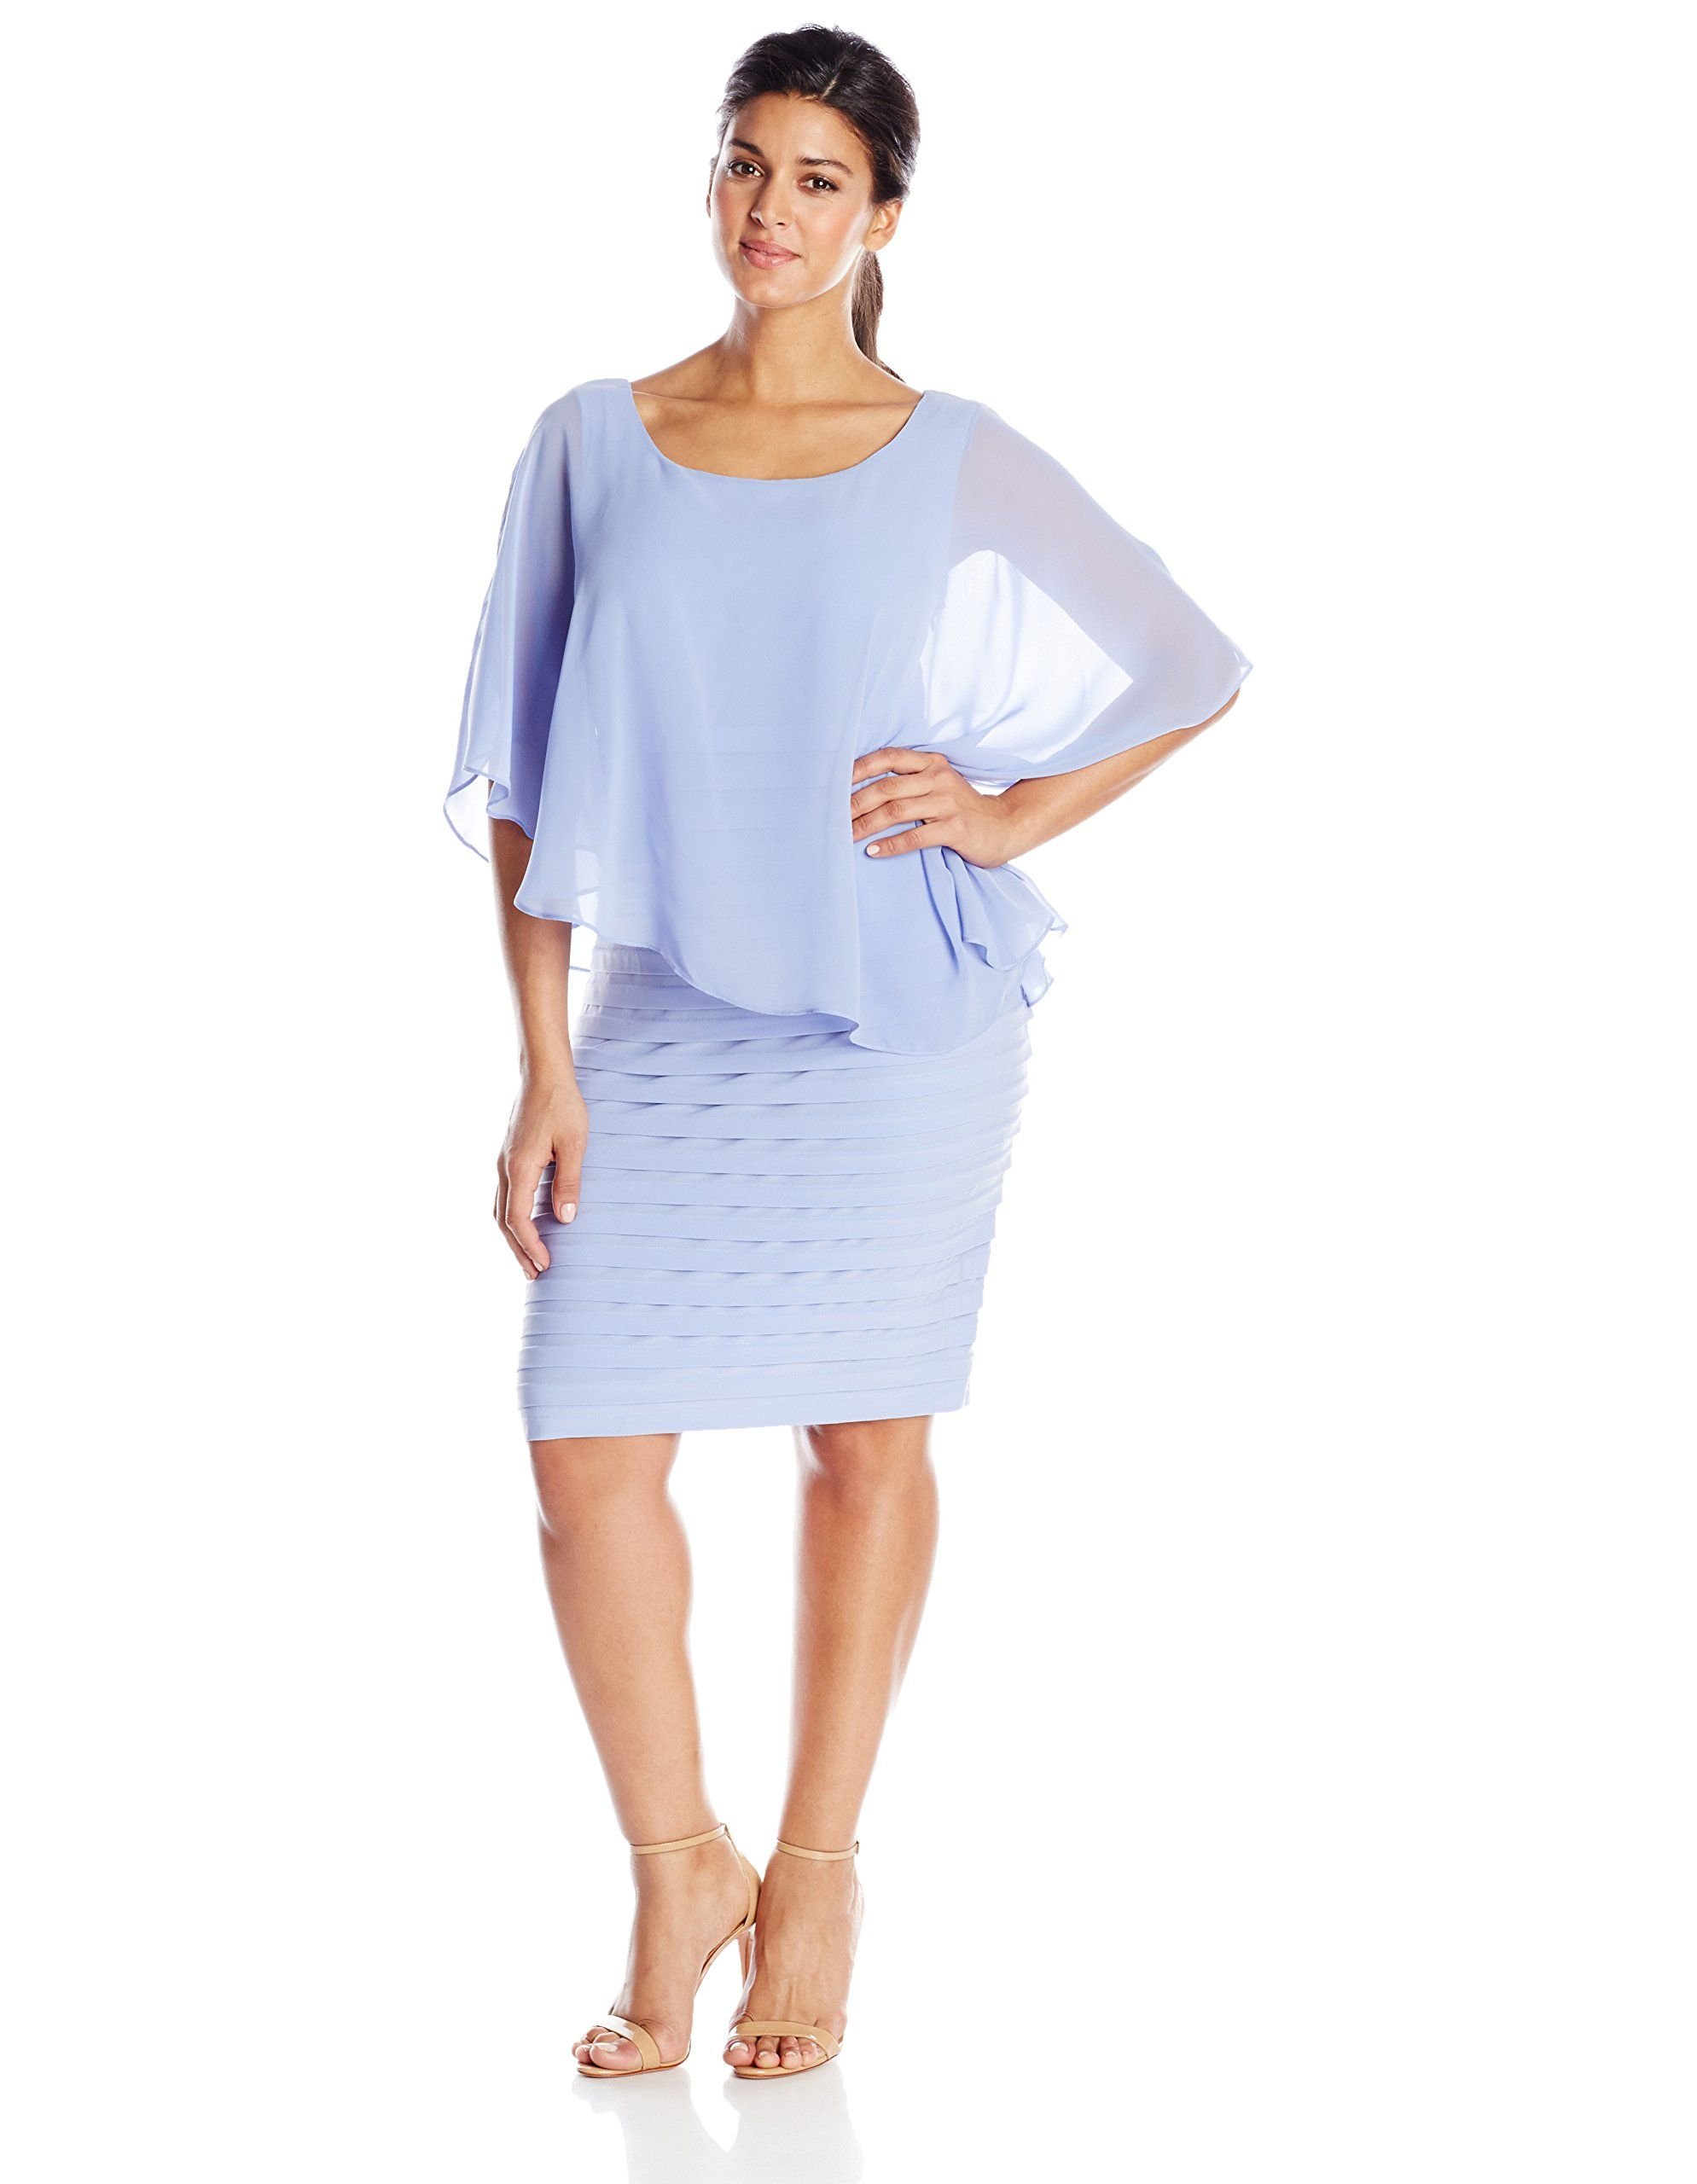 d98ed3ebf0fe Adrianna Papell Women's Plus-Size Chiffon Drape Overlay Dress with Banded  Skirt, Wisteria, 20W